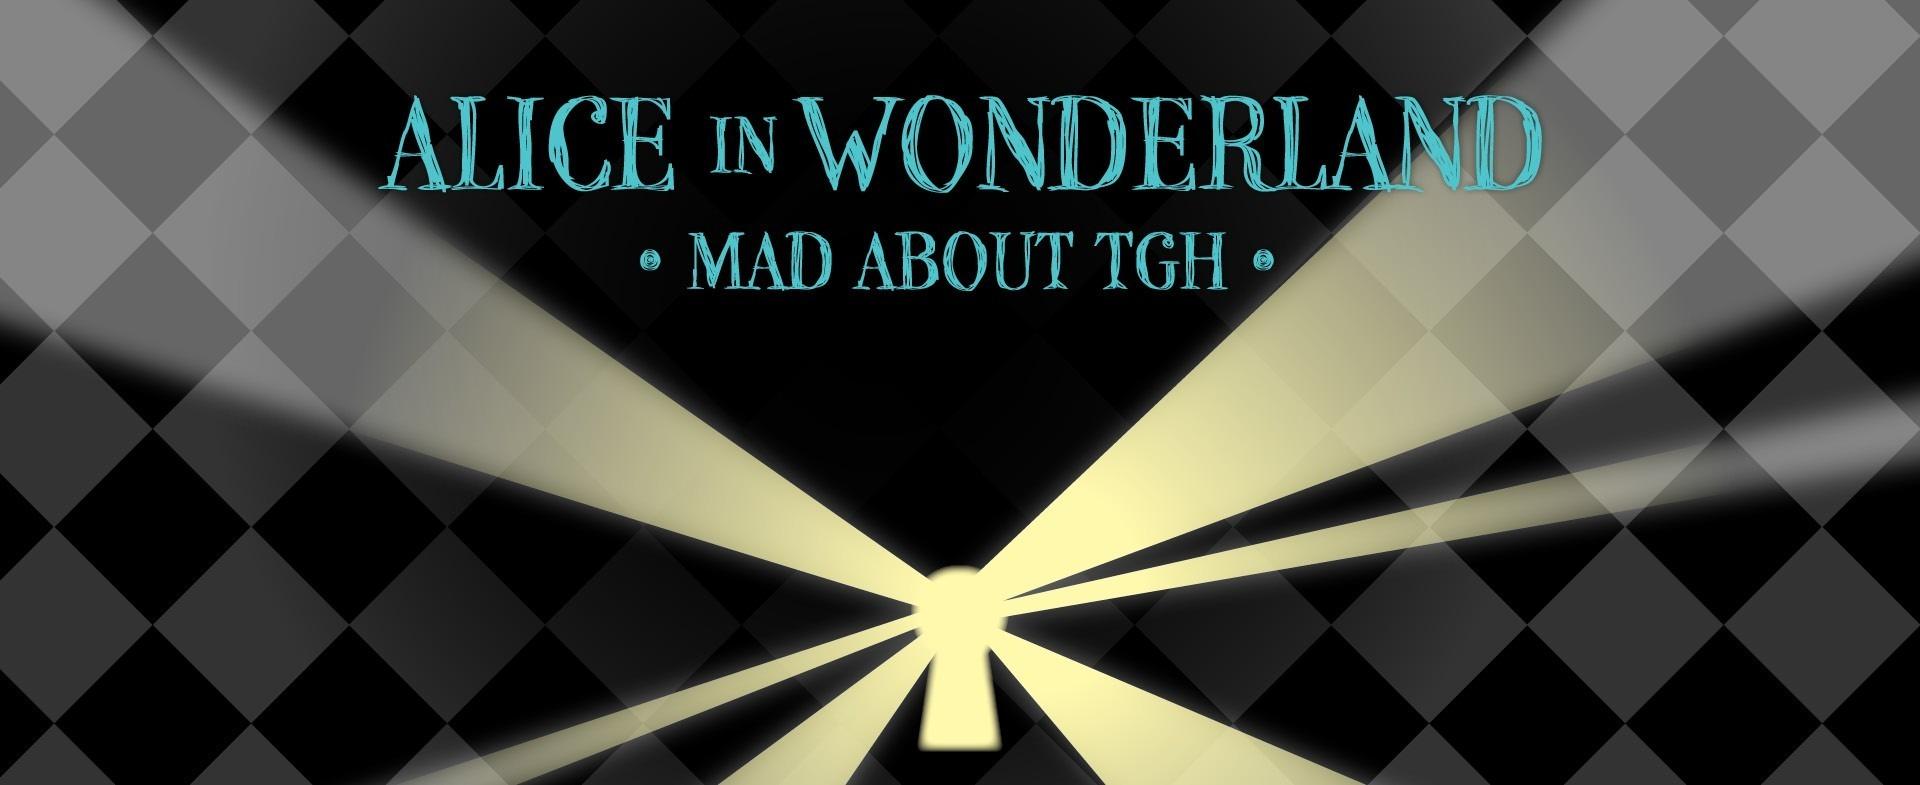 2018 Alice in Wonderland Gala header